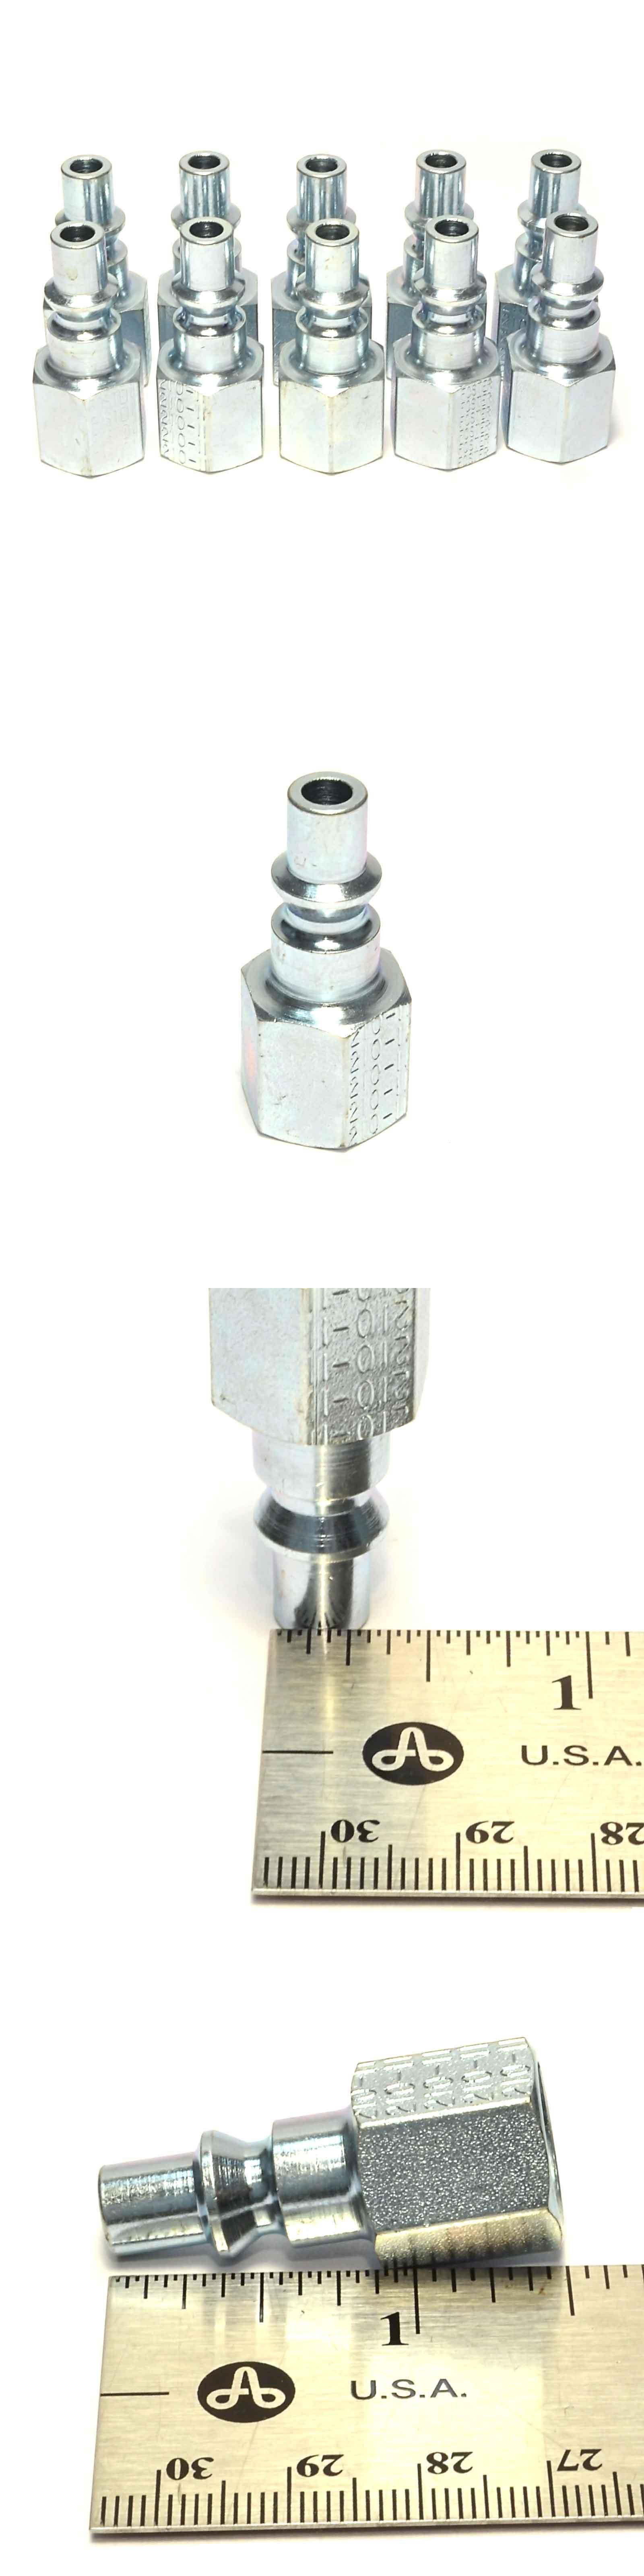 Air Tools 42340: Aro 210 - Air Hose Fittings 1 4 Npt